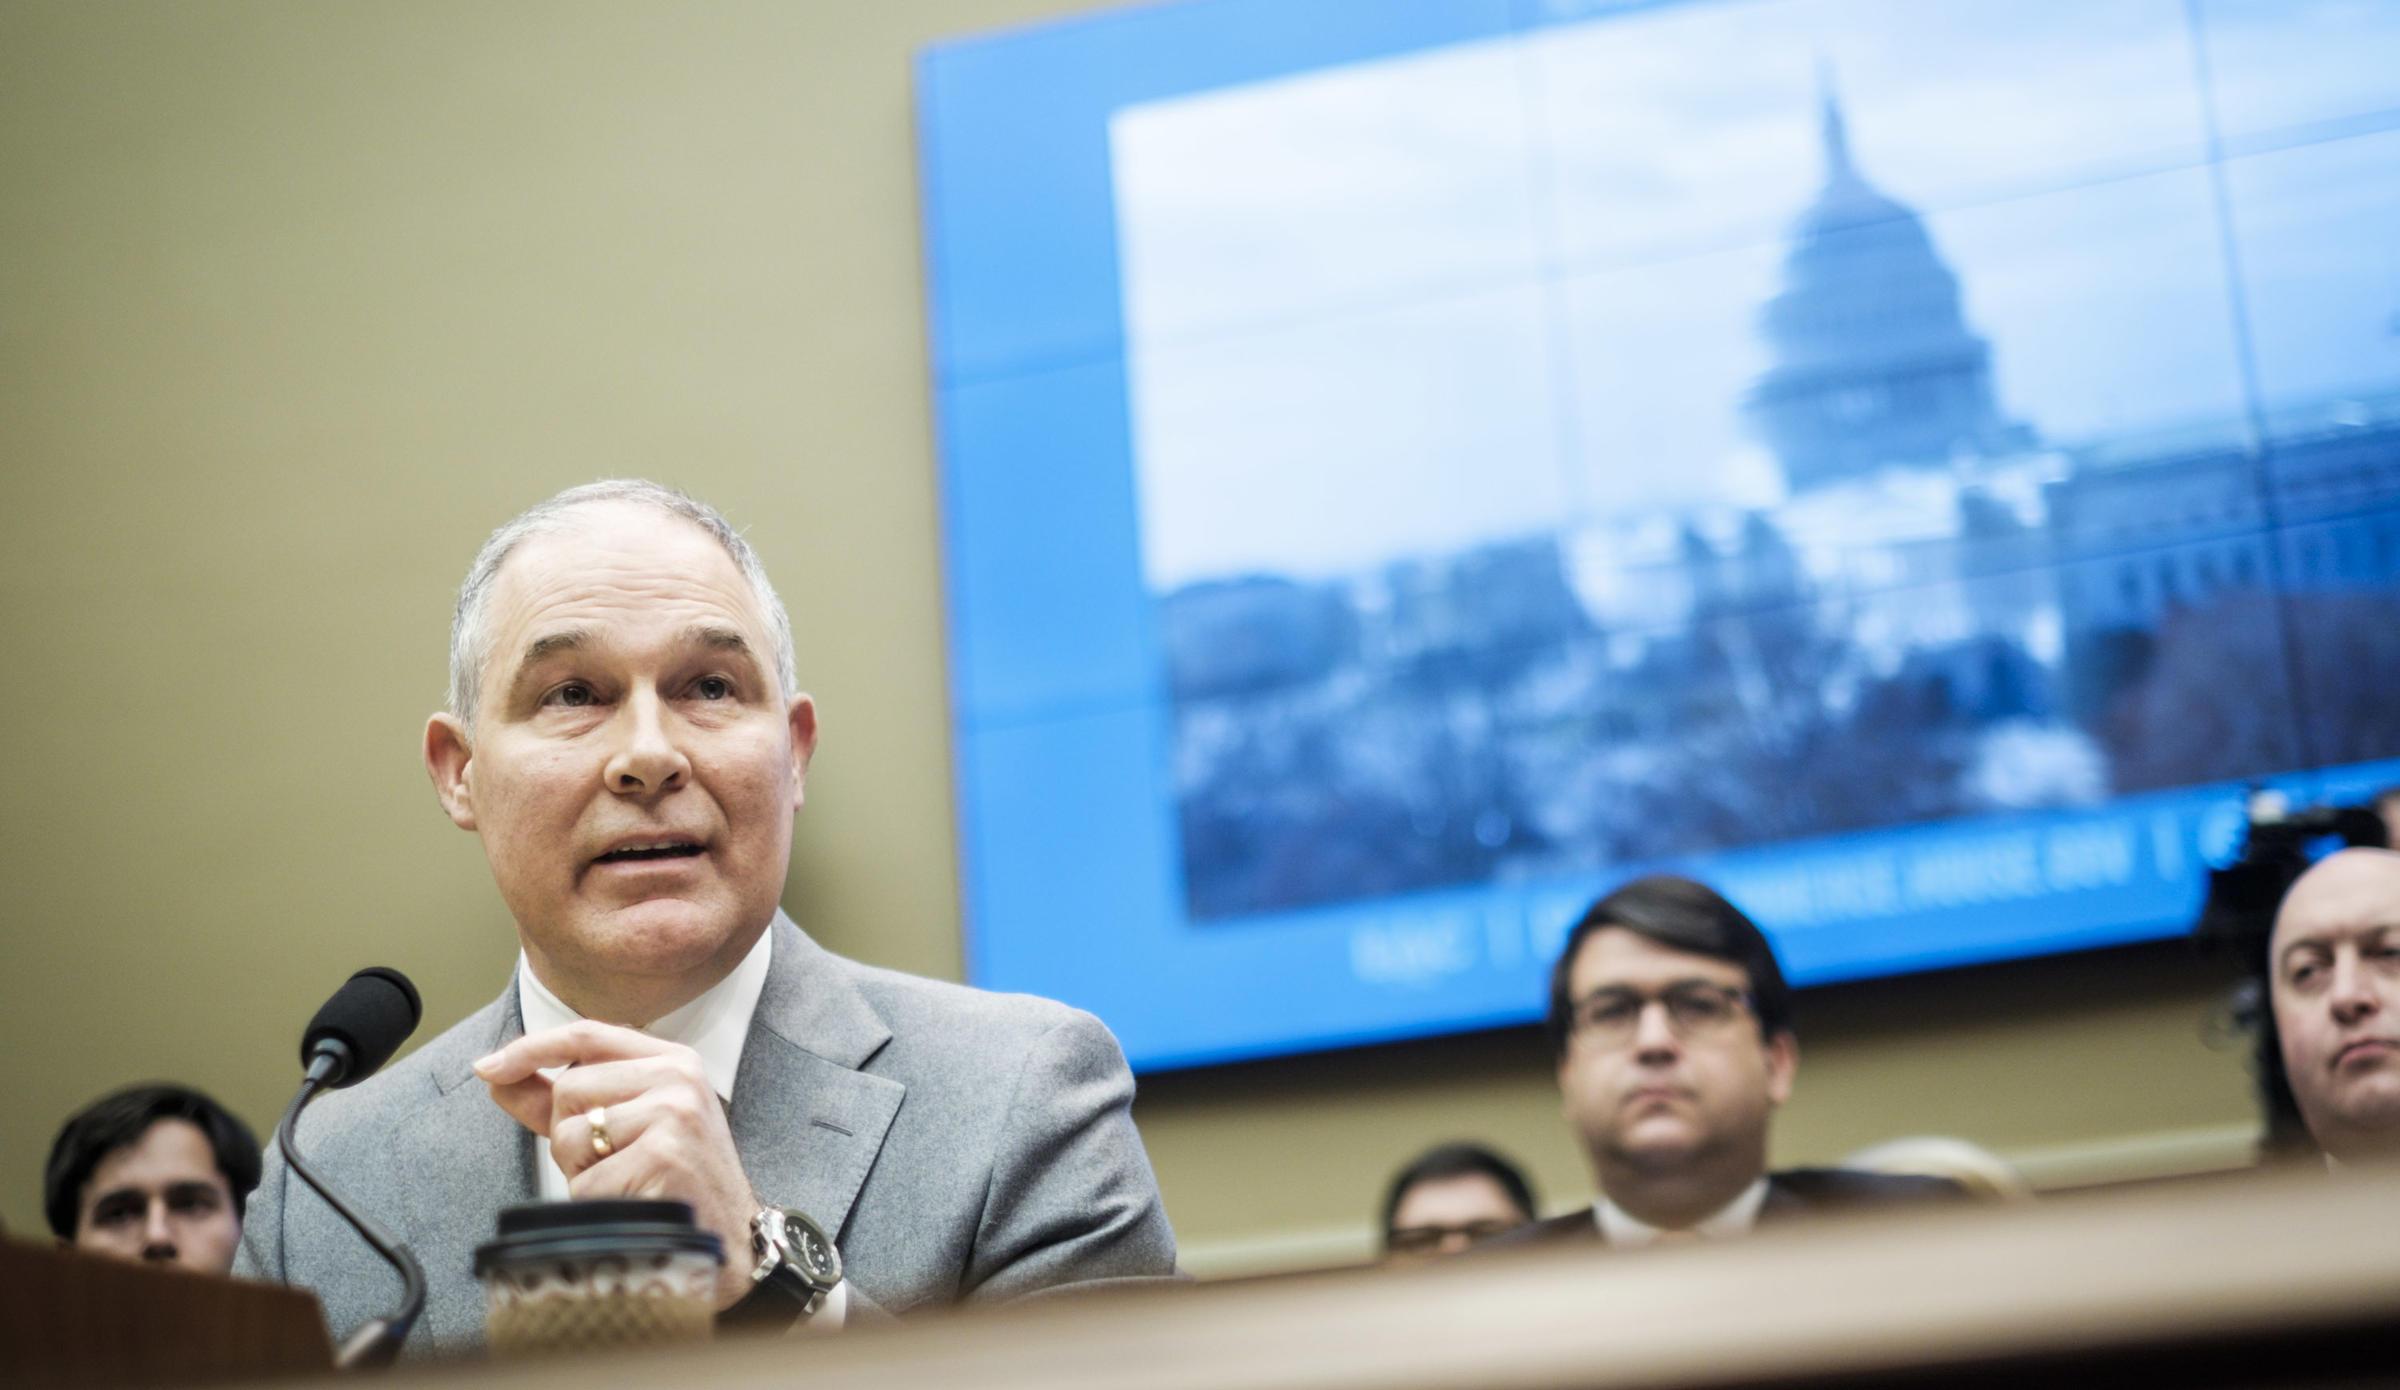 EPA must explain why Pruitt's $43000 phone booth was legal: Republican senator